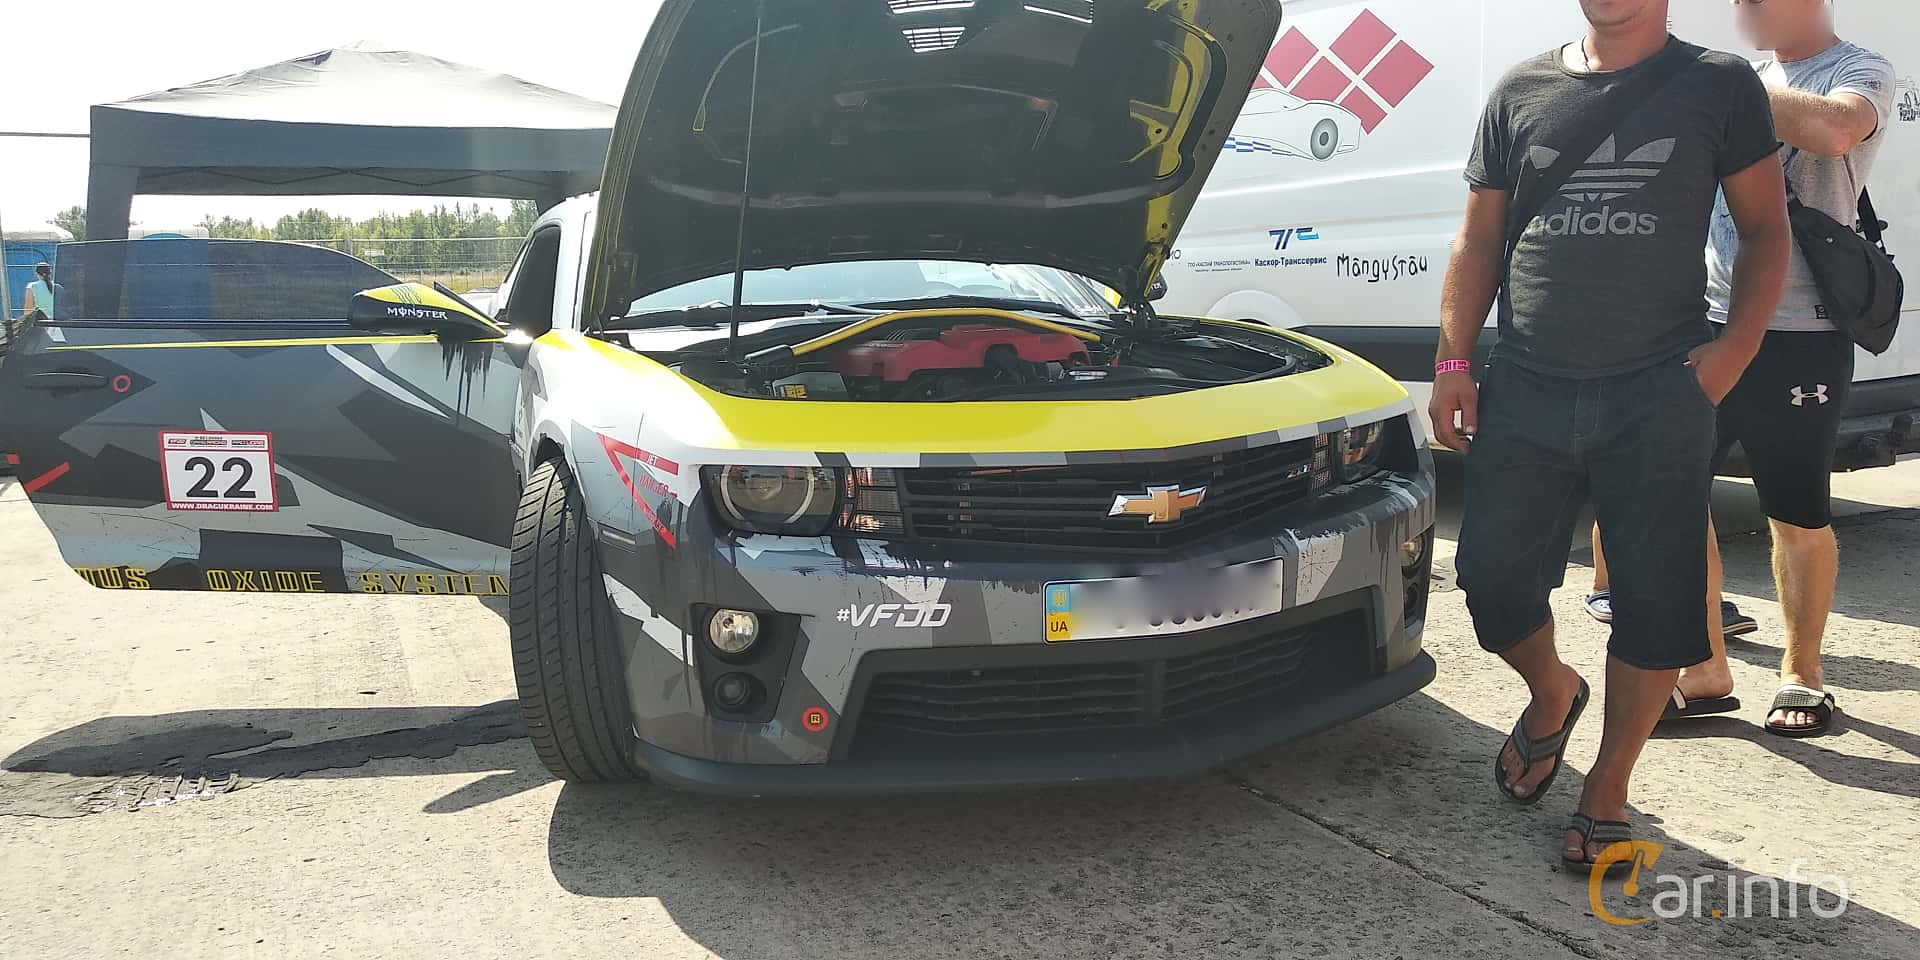 Chevrolet Camaro ZL1 6.2 V8 587hp, 2013 at Proudrs Drag racing Poltava 2019